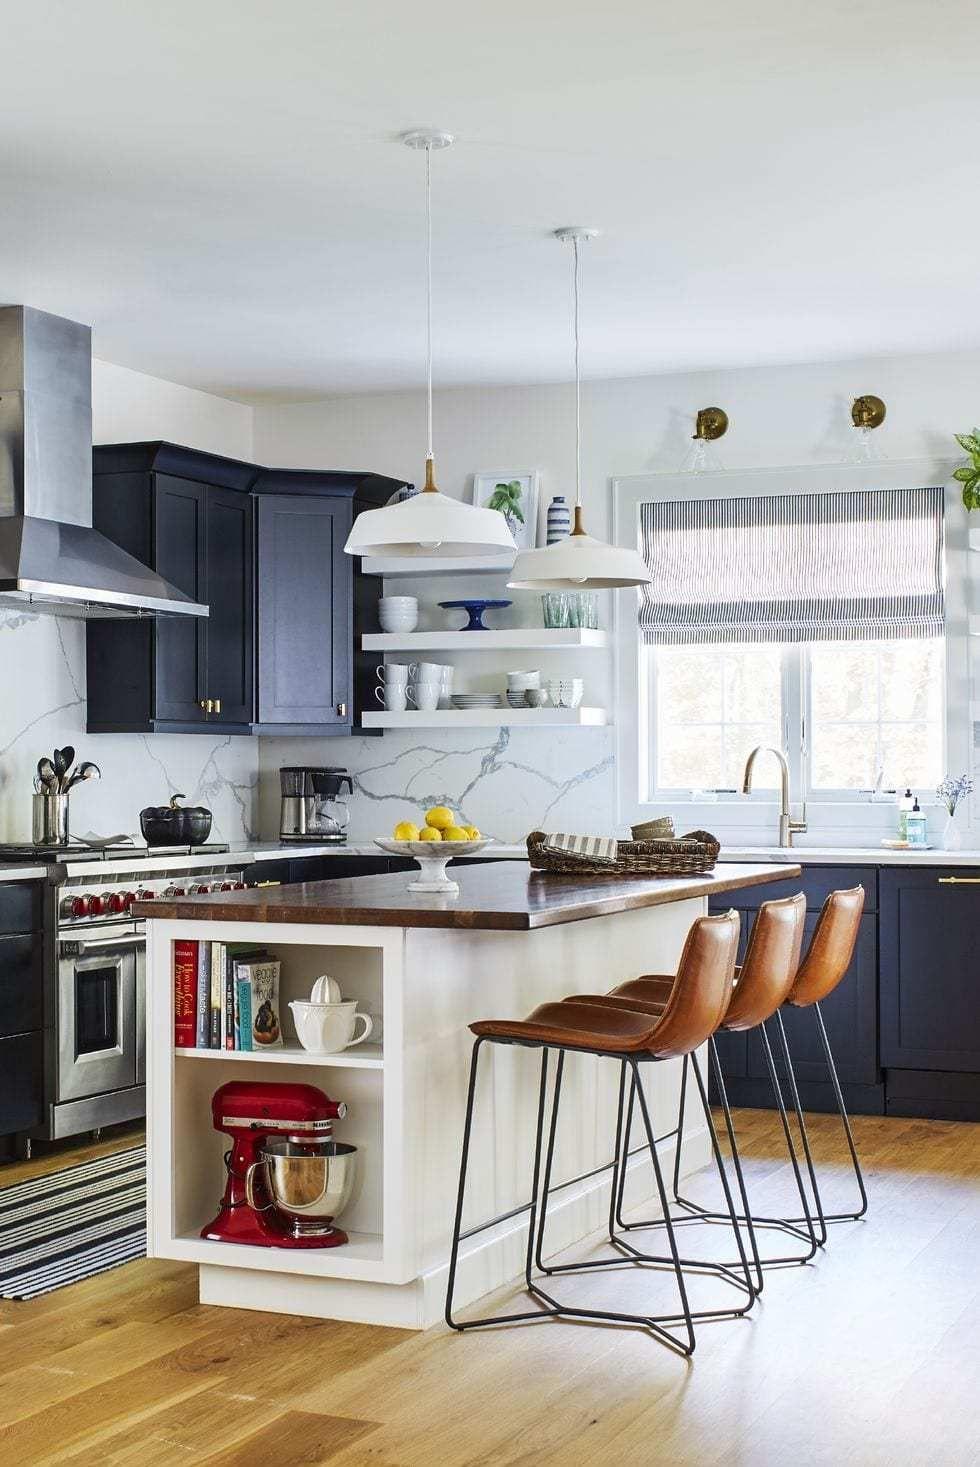 25 Inspiring Open Kitchen Ideas You Should Explore ...